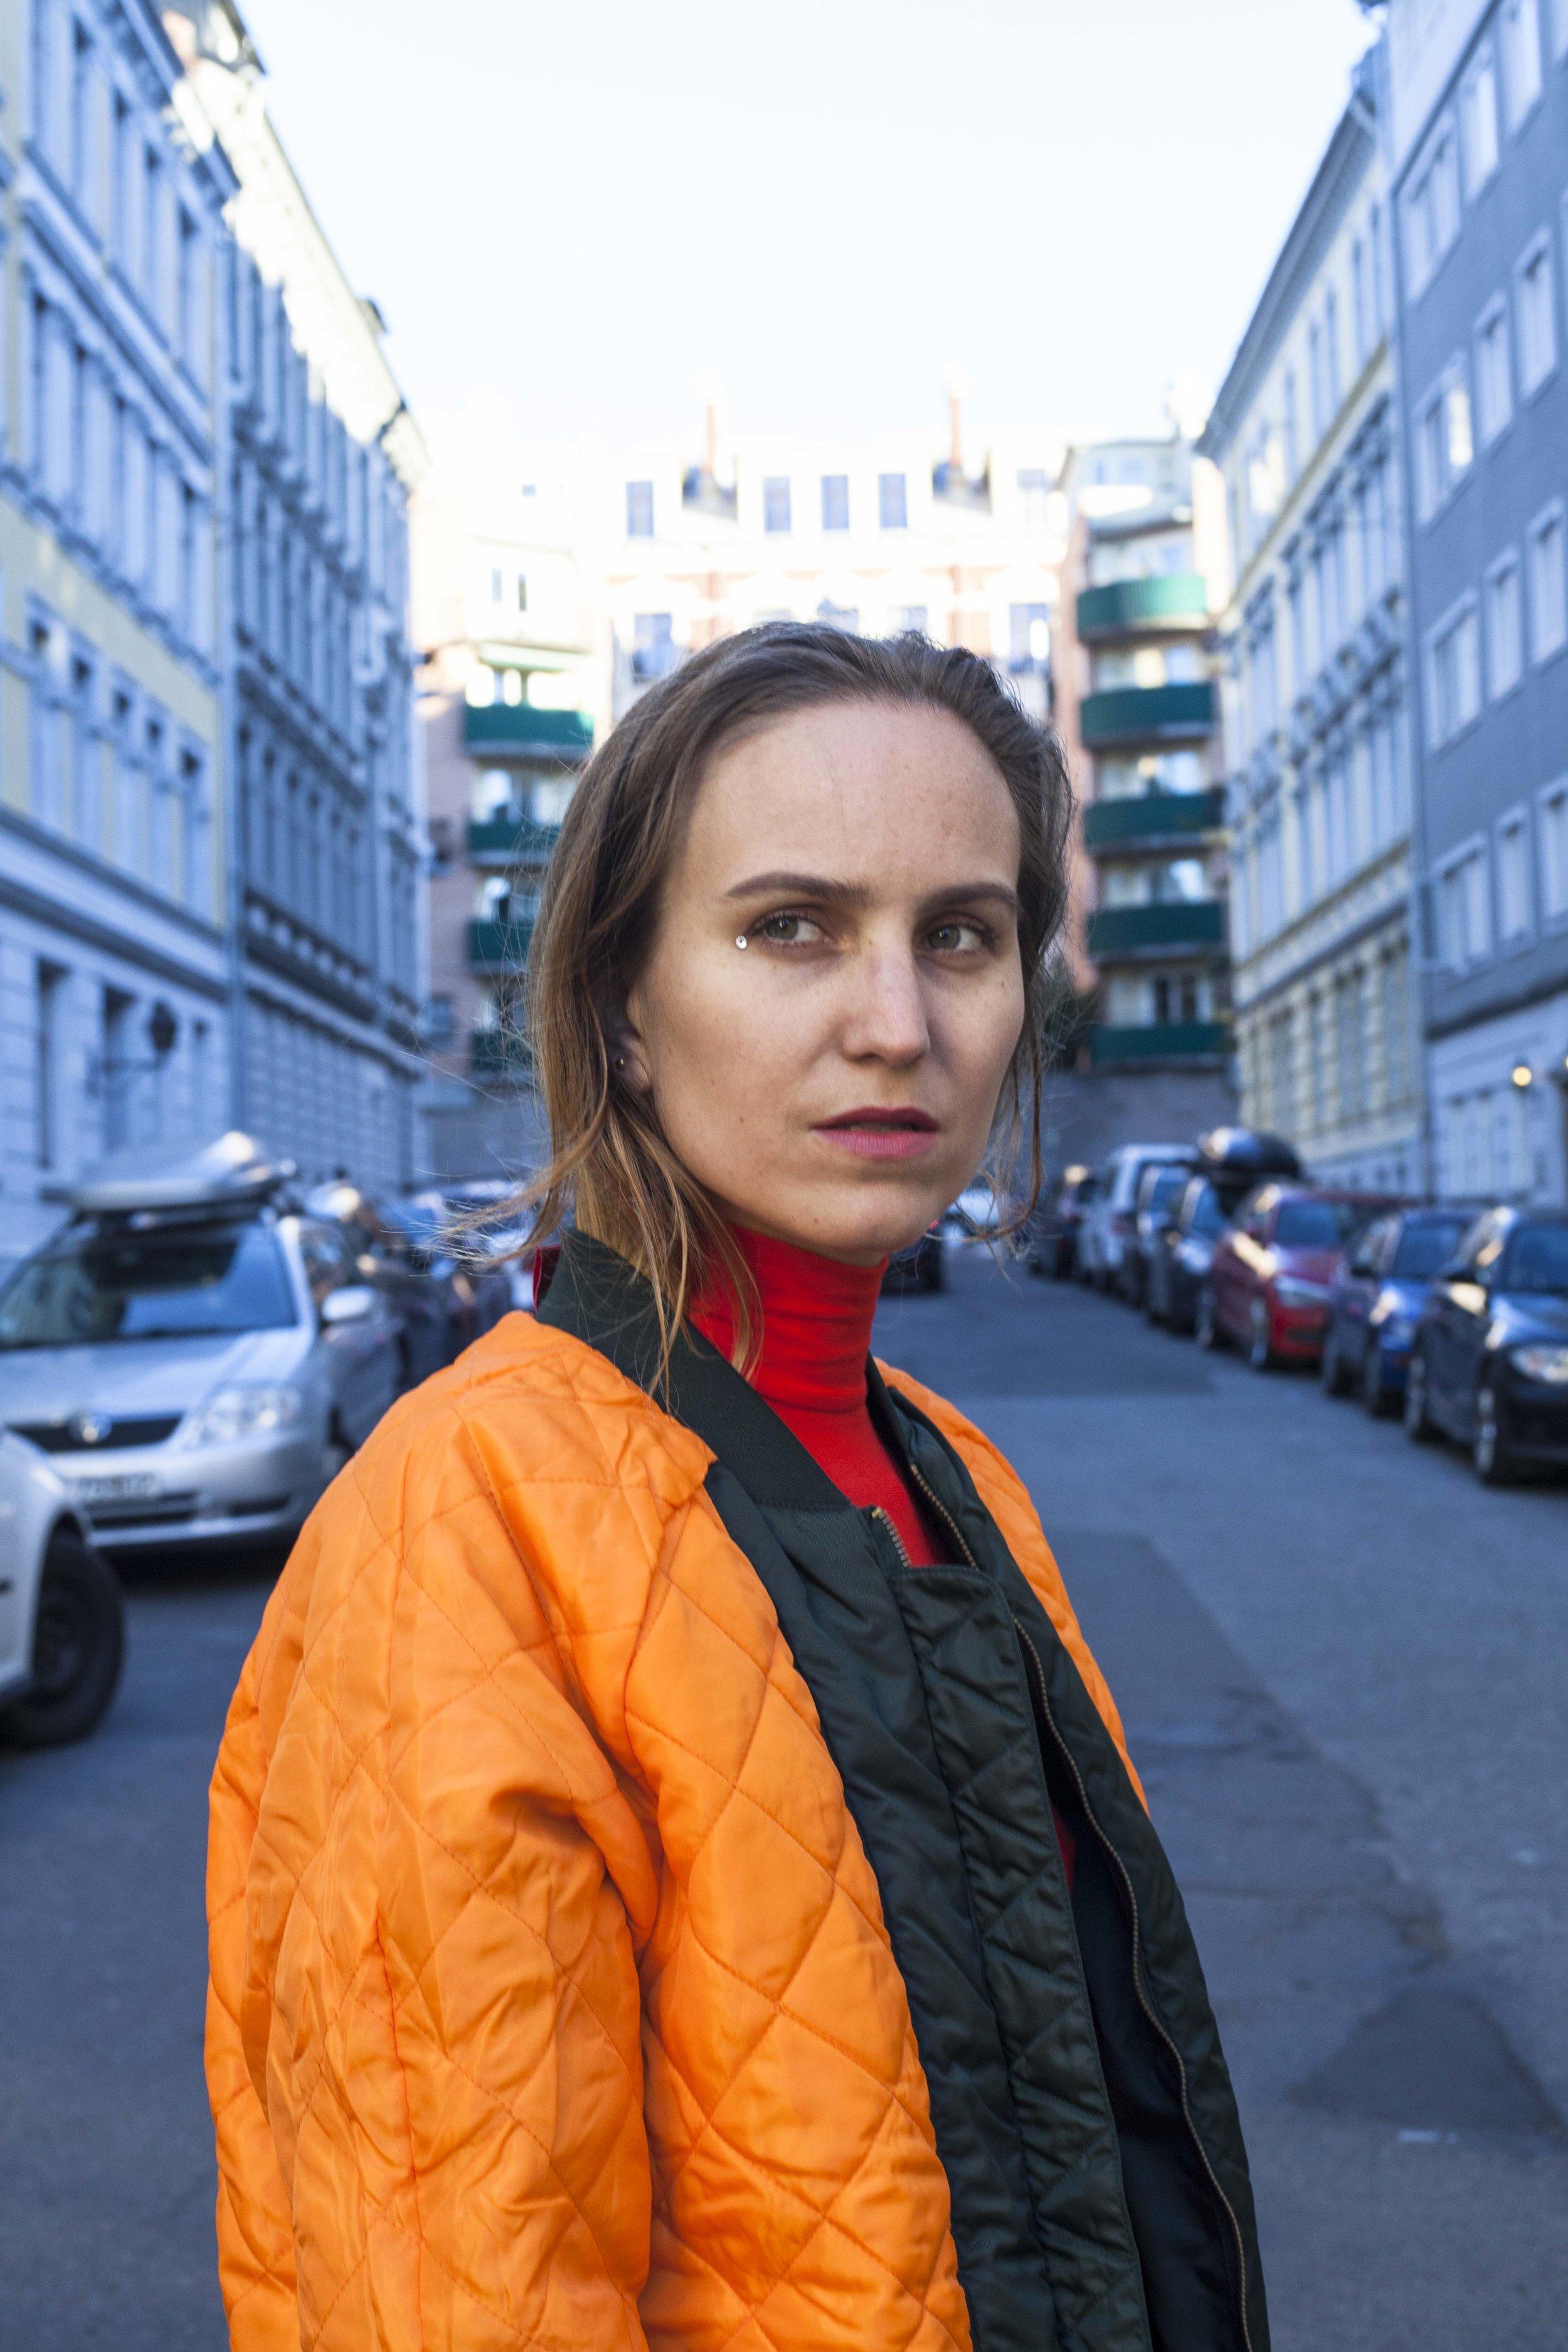 JM_Marit Soldal_Foto Kristine Helliesen_small_4.jpg